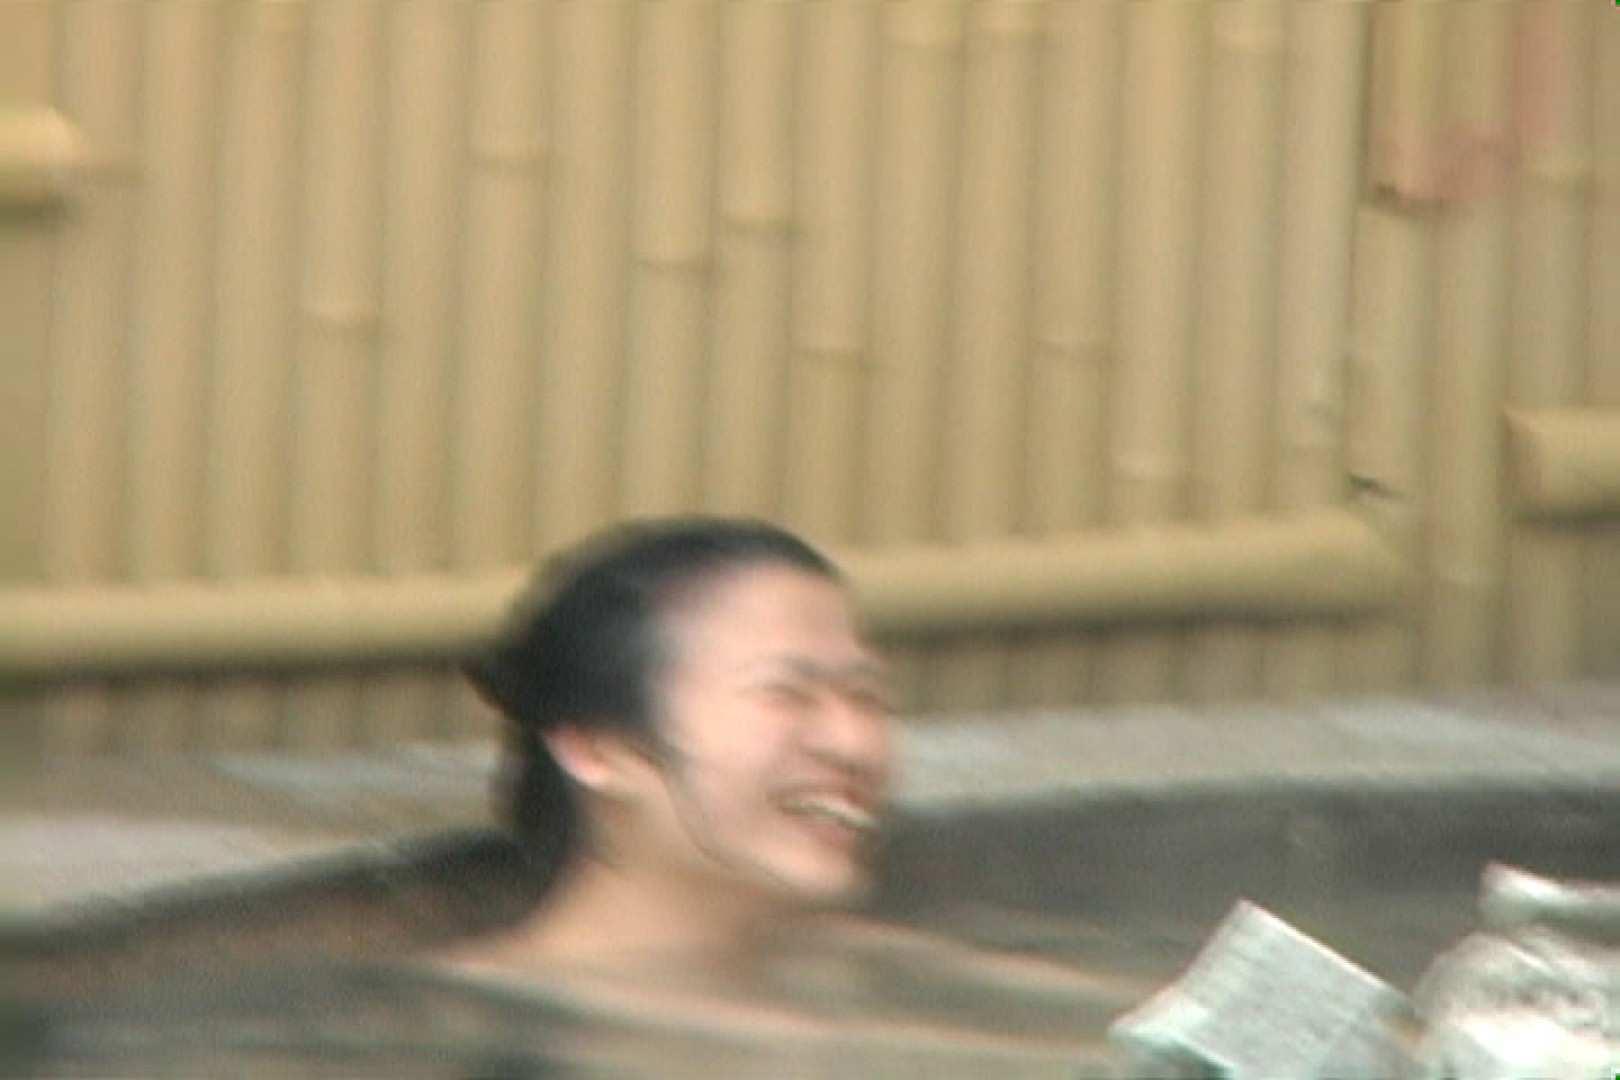 Aquaな露天風呂Vol.647 0   0  58連発 27